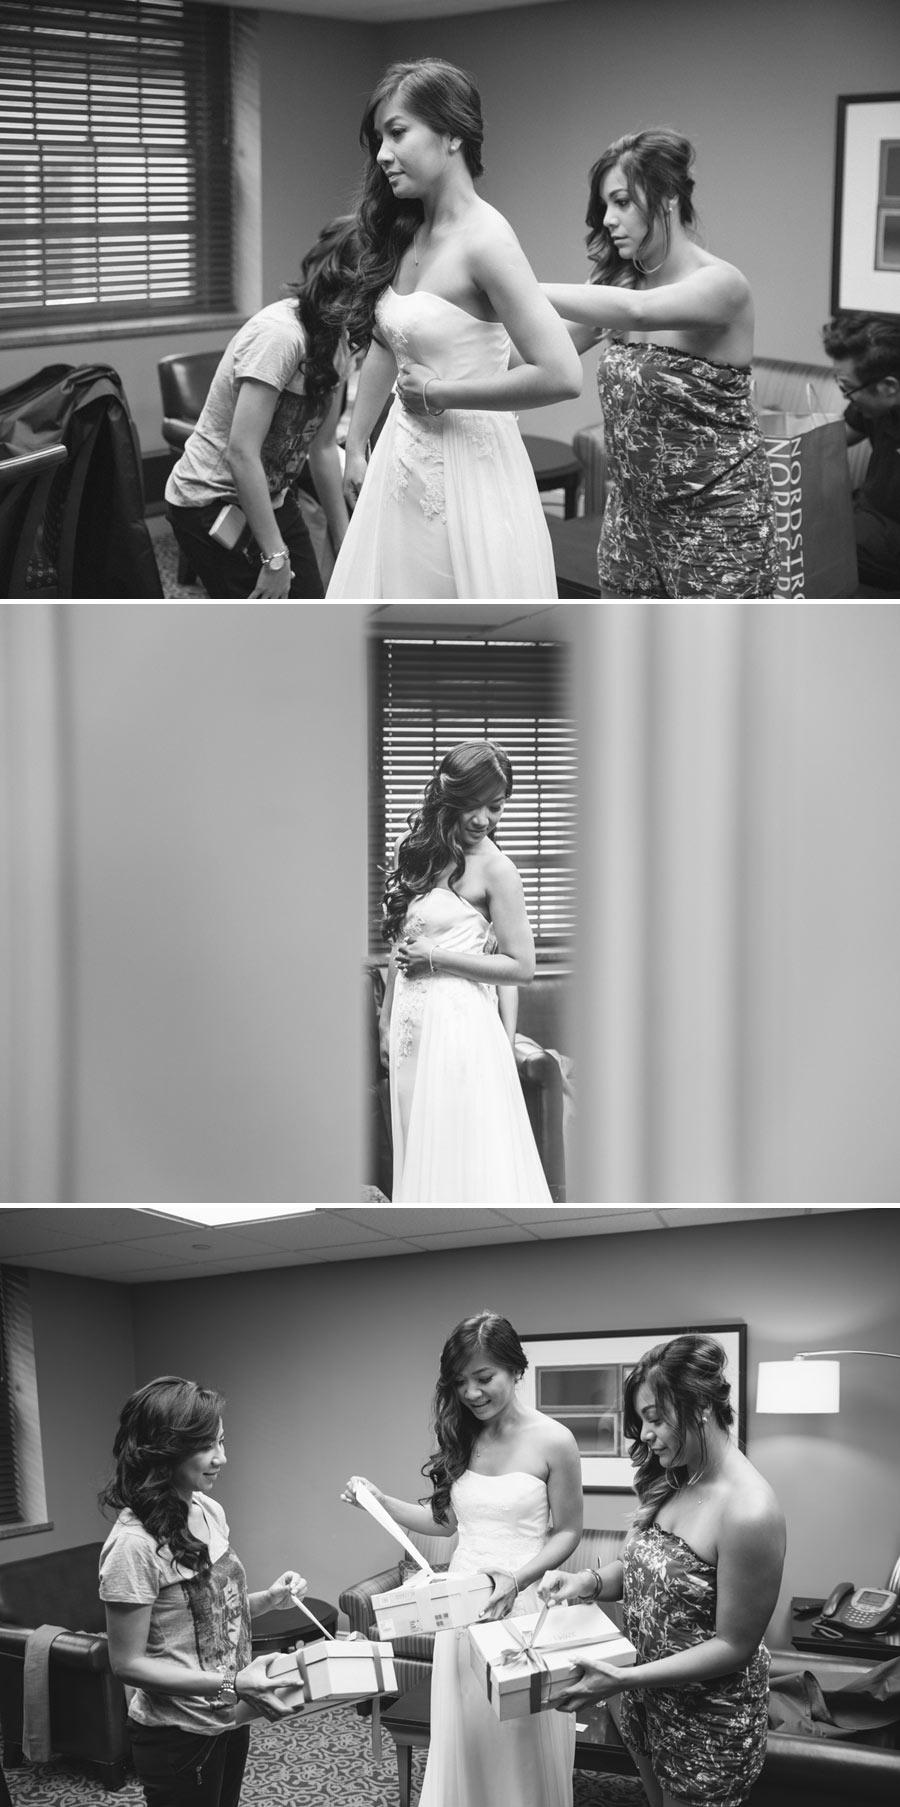 pittsburgh-wedding-photographer-at-university-club-vietnamese-tea-ceremony-wedding-oakland-14